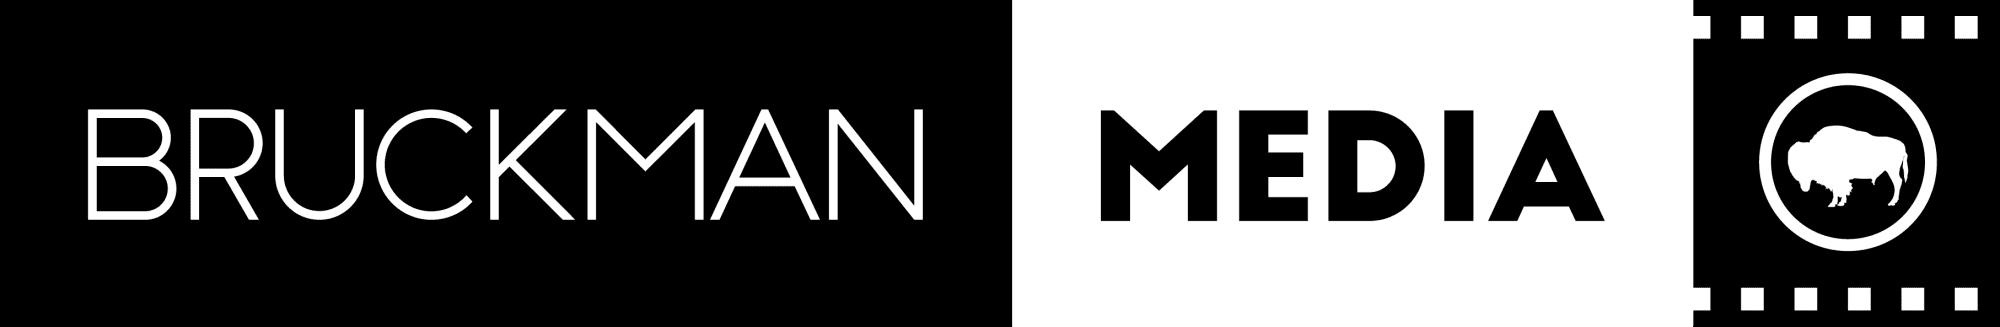 Bruckman Media